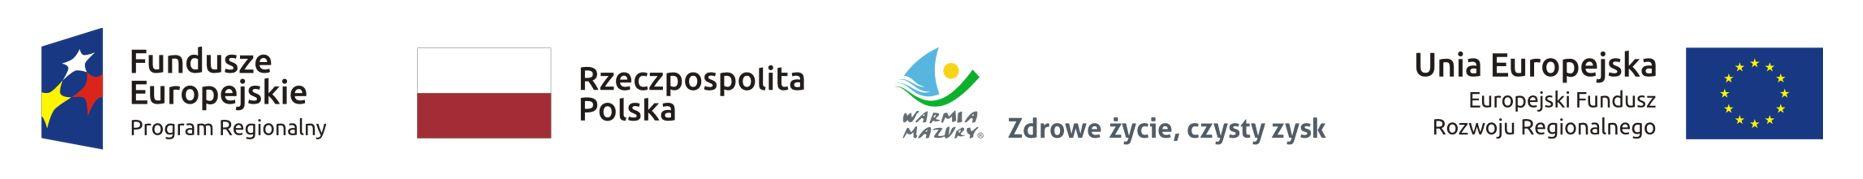 logotyp-ue